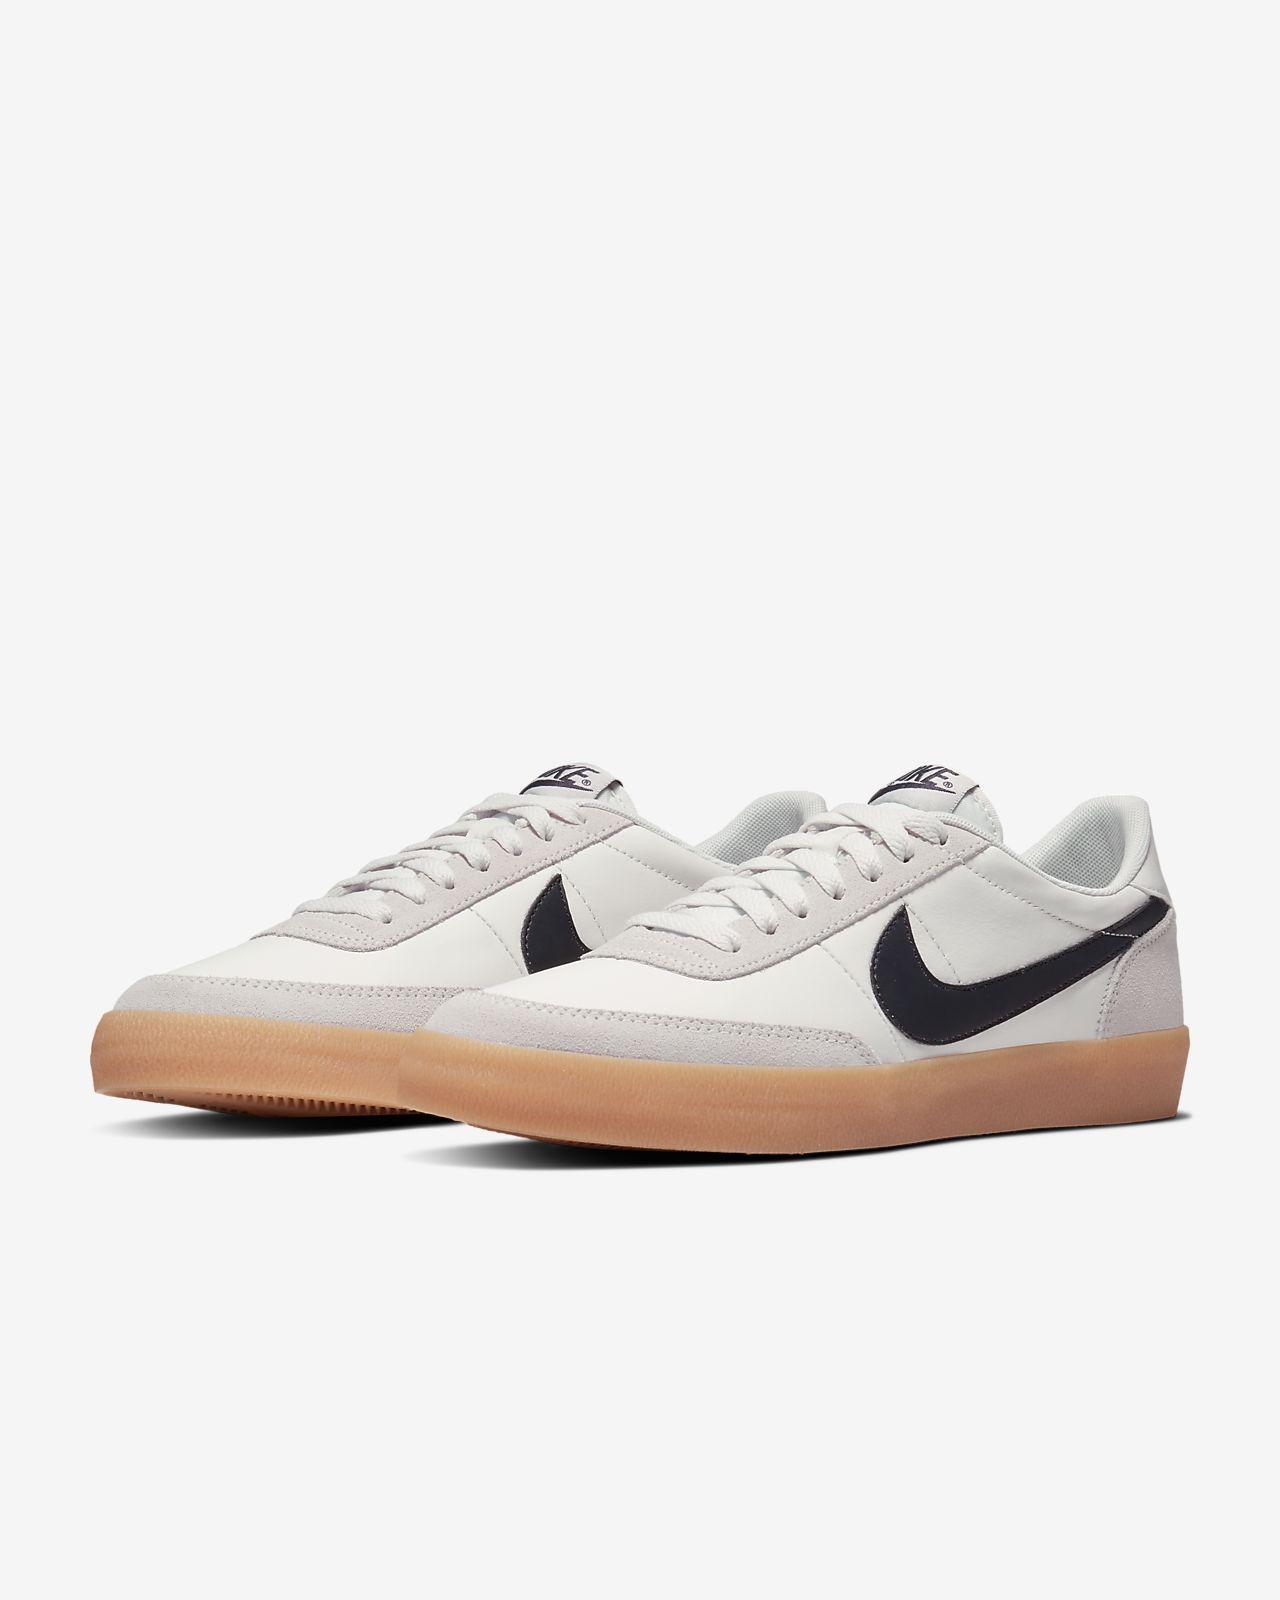 Nike killshot, Shoes mens, Mens nike shoes